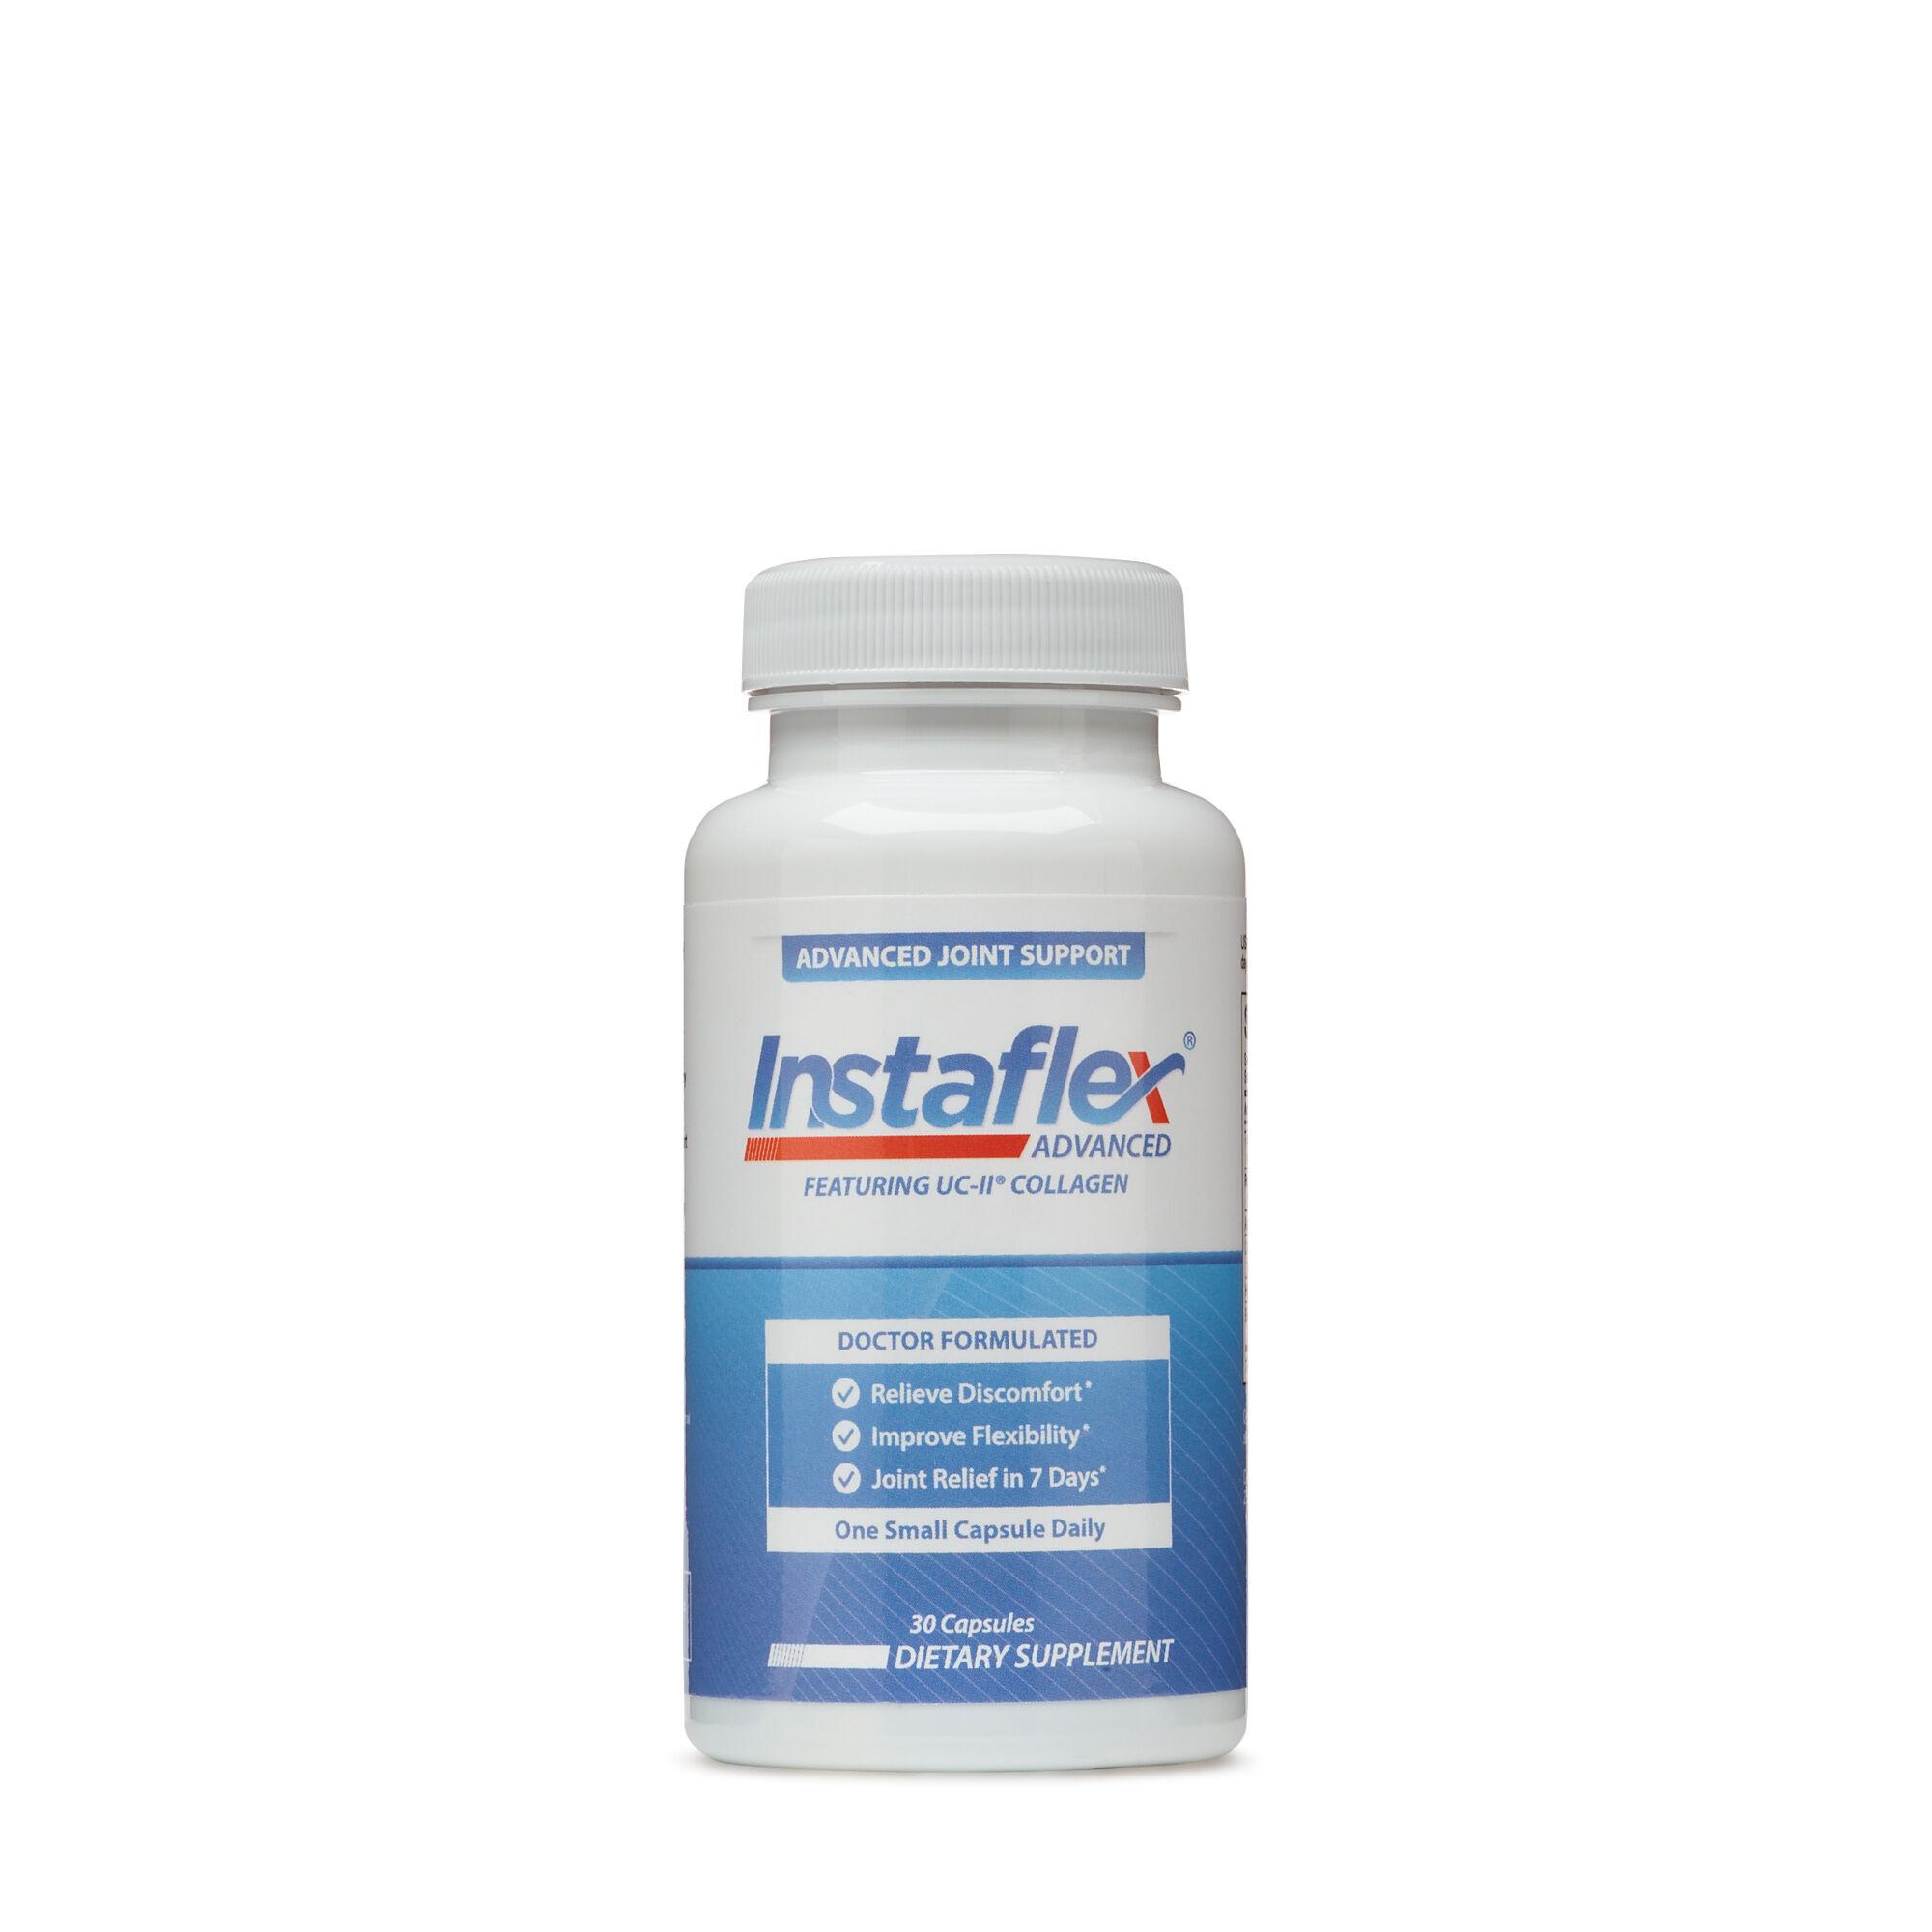 Save 50% on Instaflex Advanced Featuring UC-II Collagen